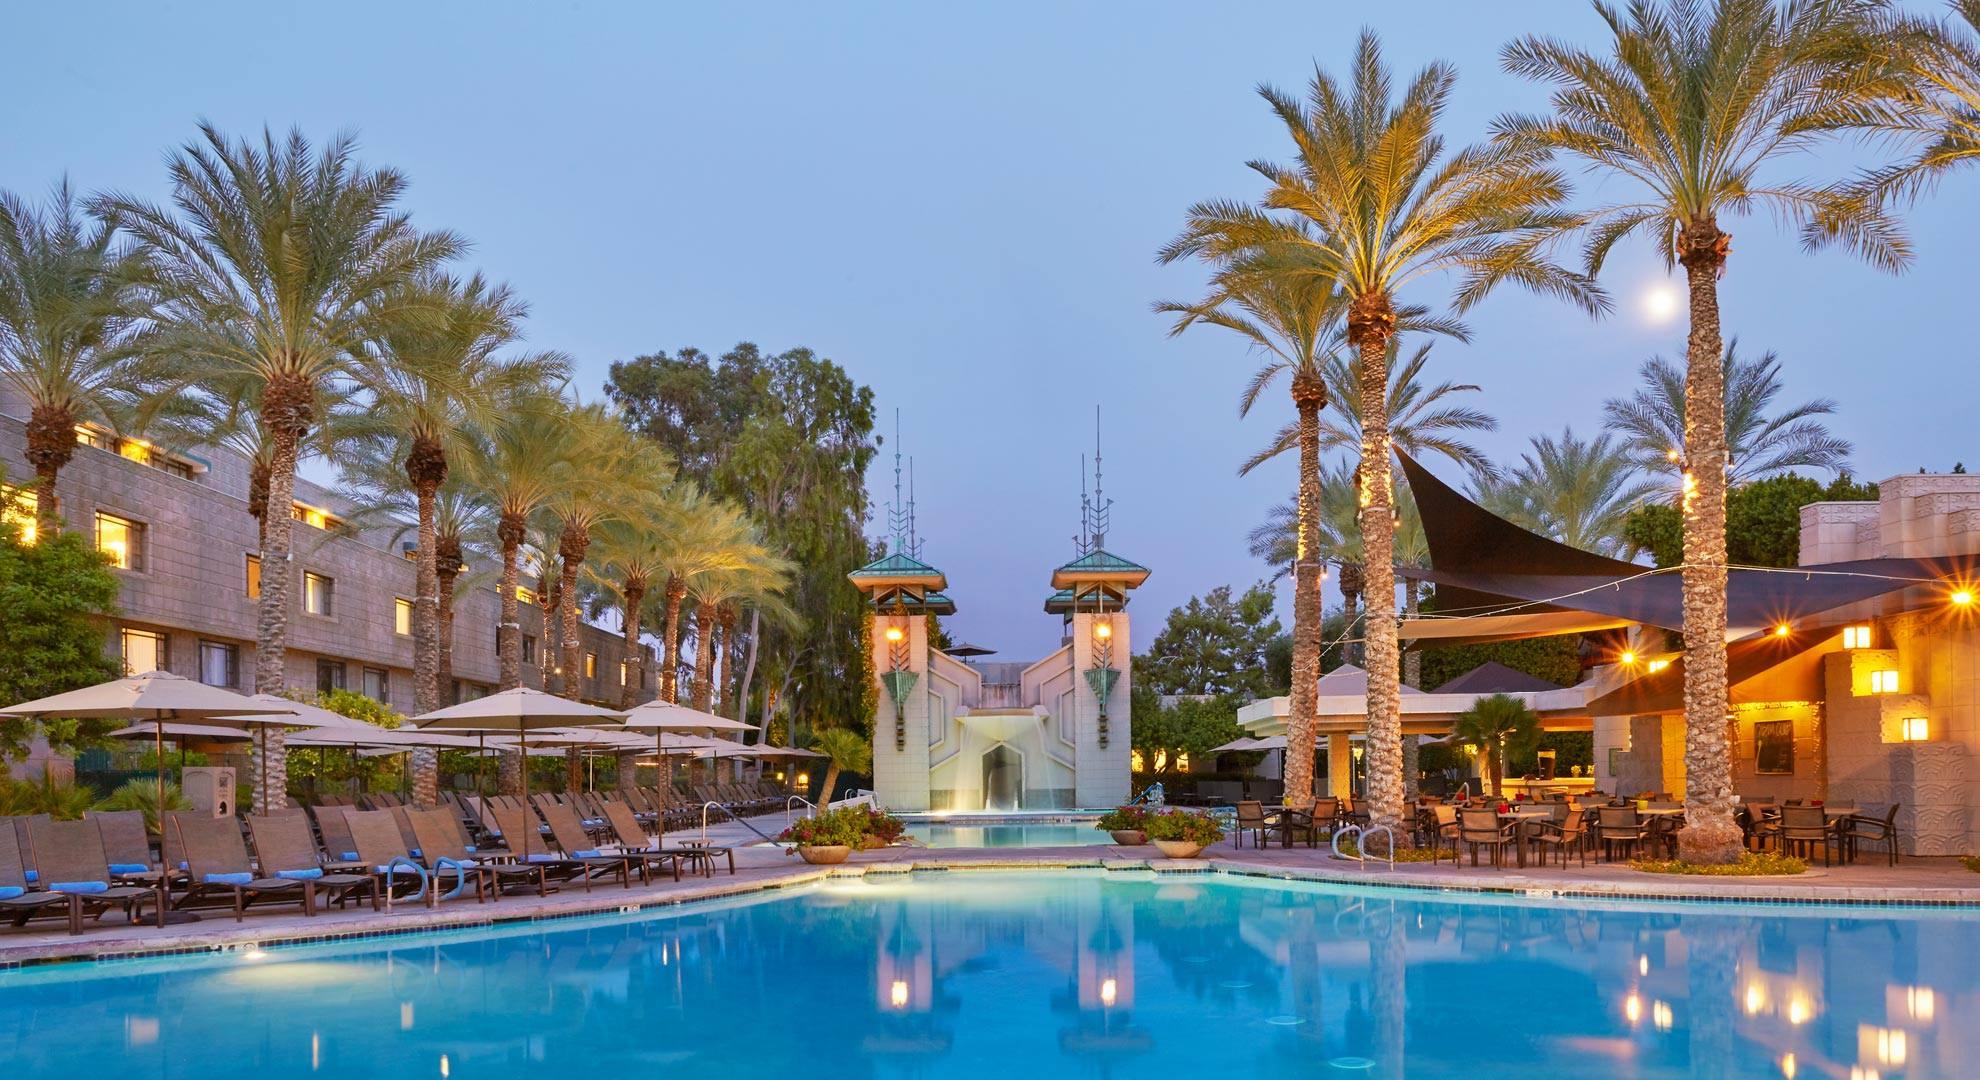 7 Fun Arizona Vacations